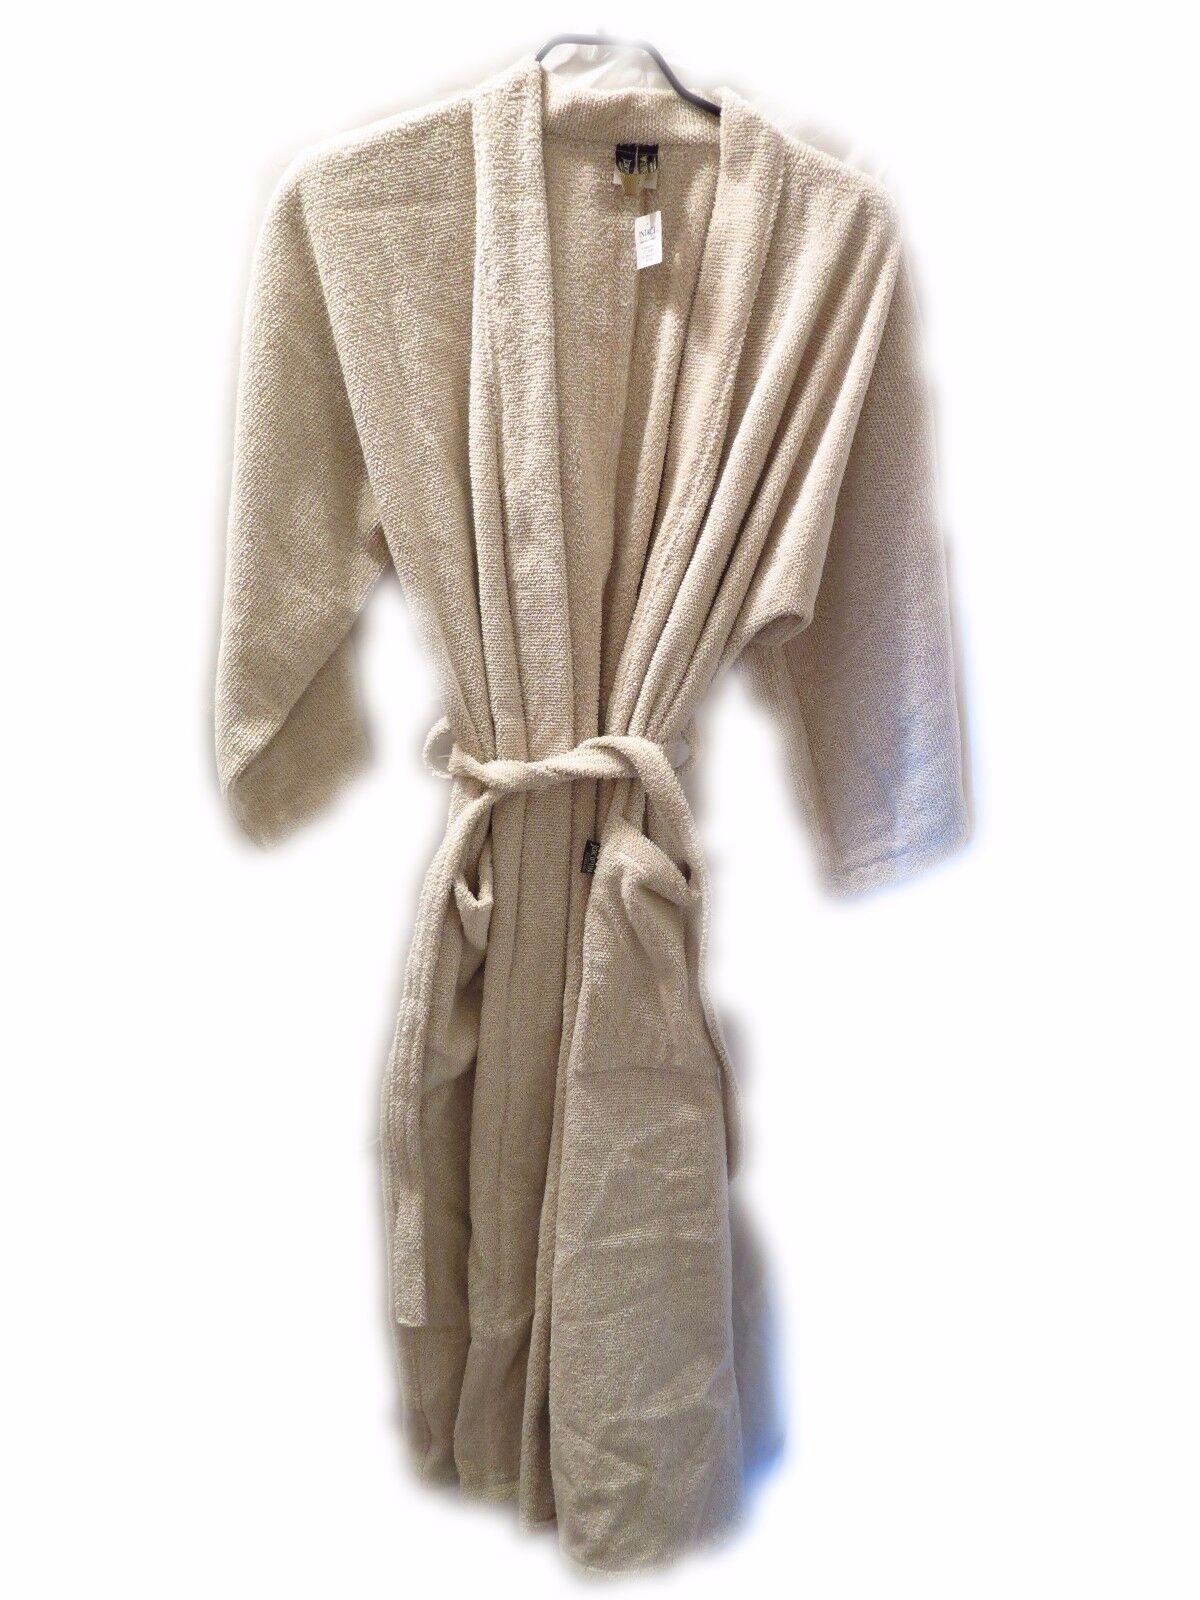 Jokipiin Pellava Leinen Sauna Mantel Kimono Villa weiß/beige Bademantel Gr. S